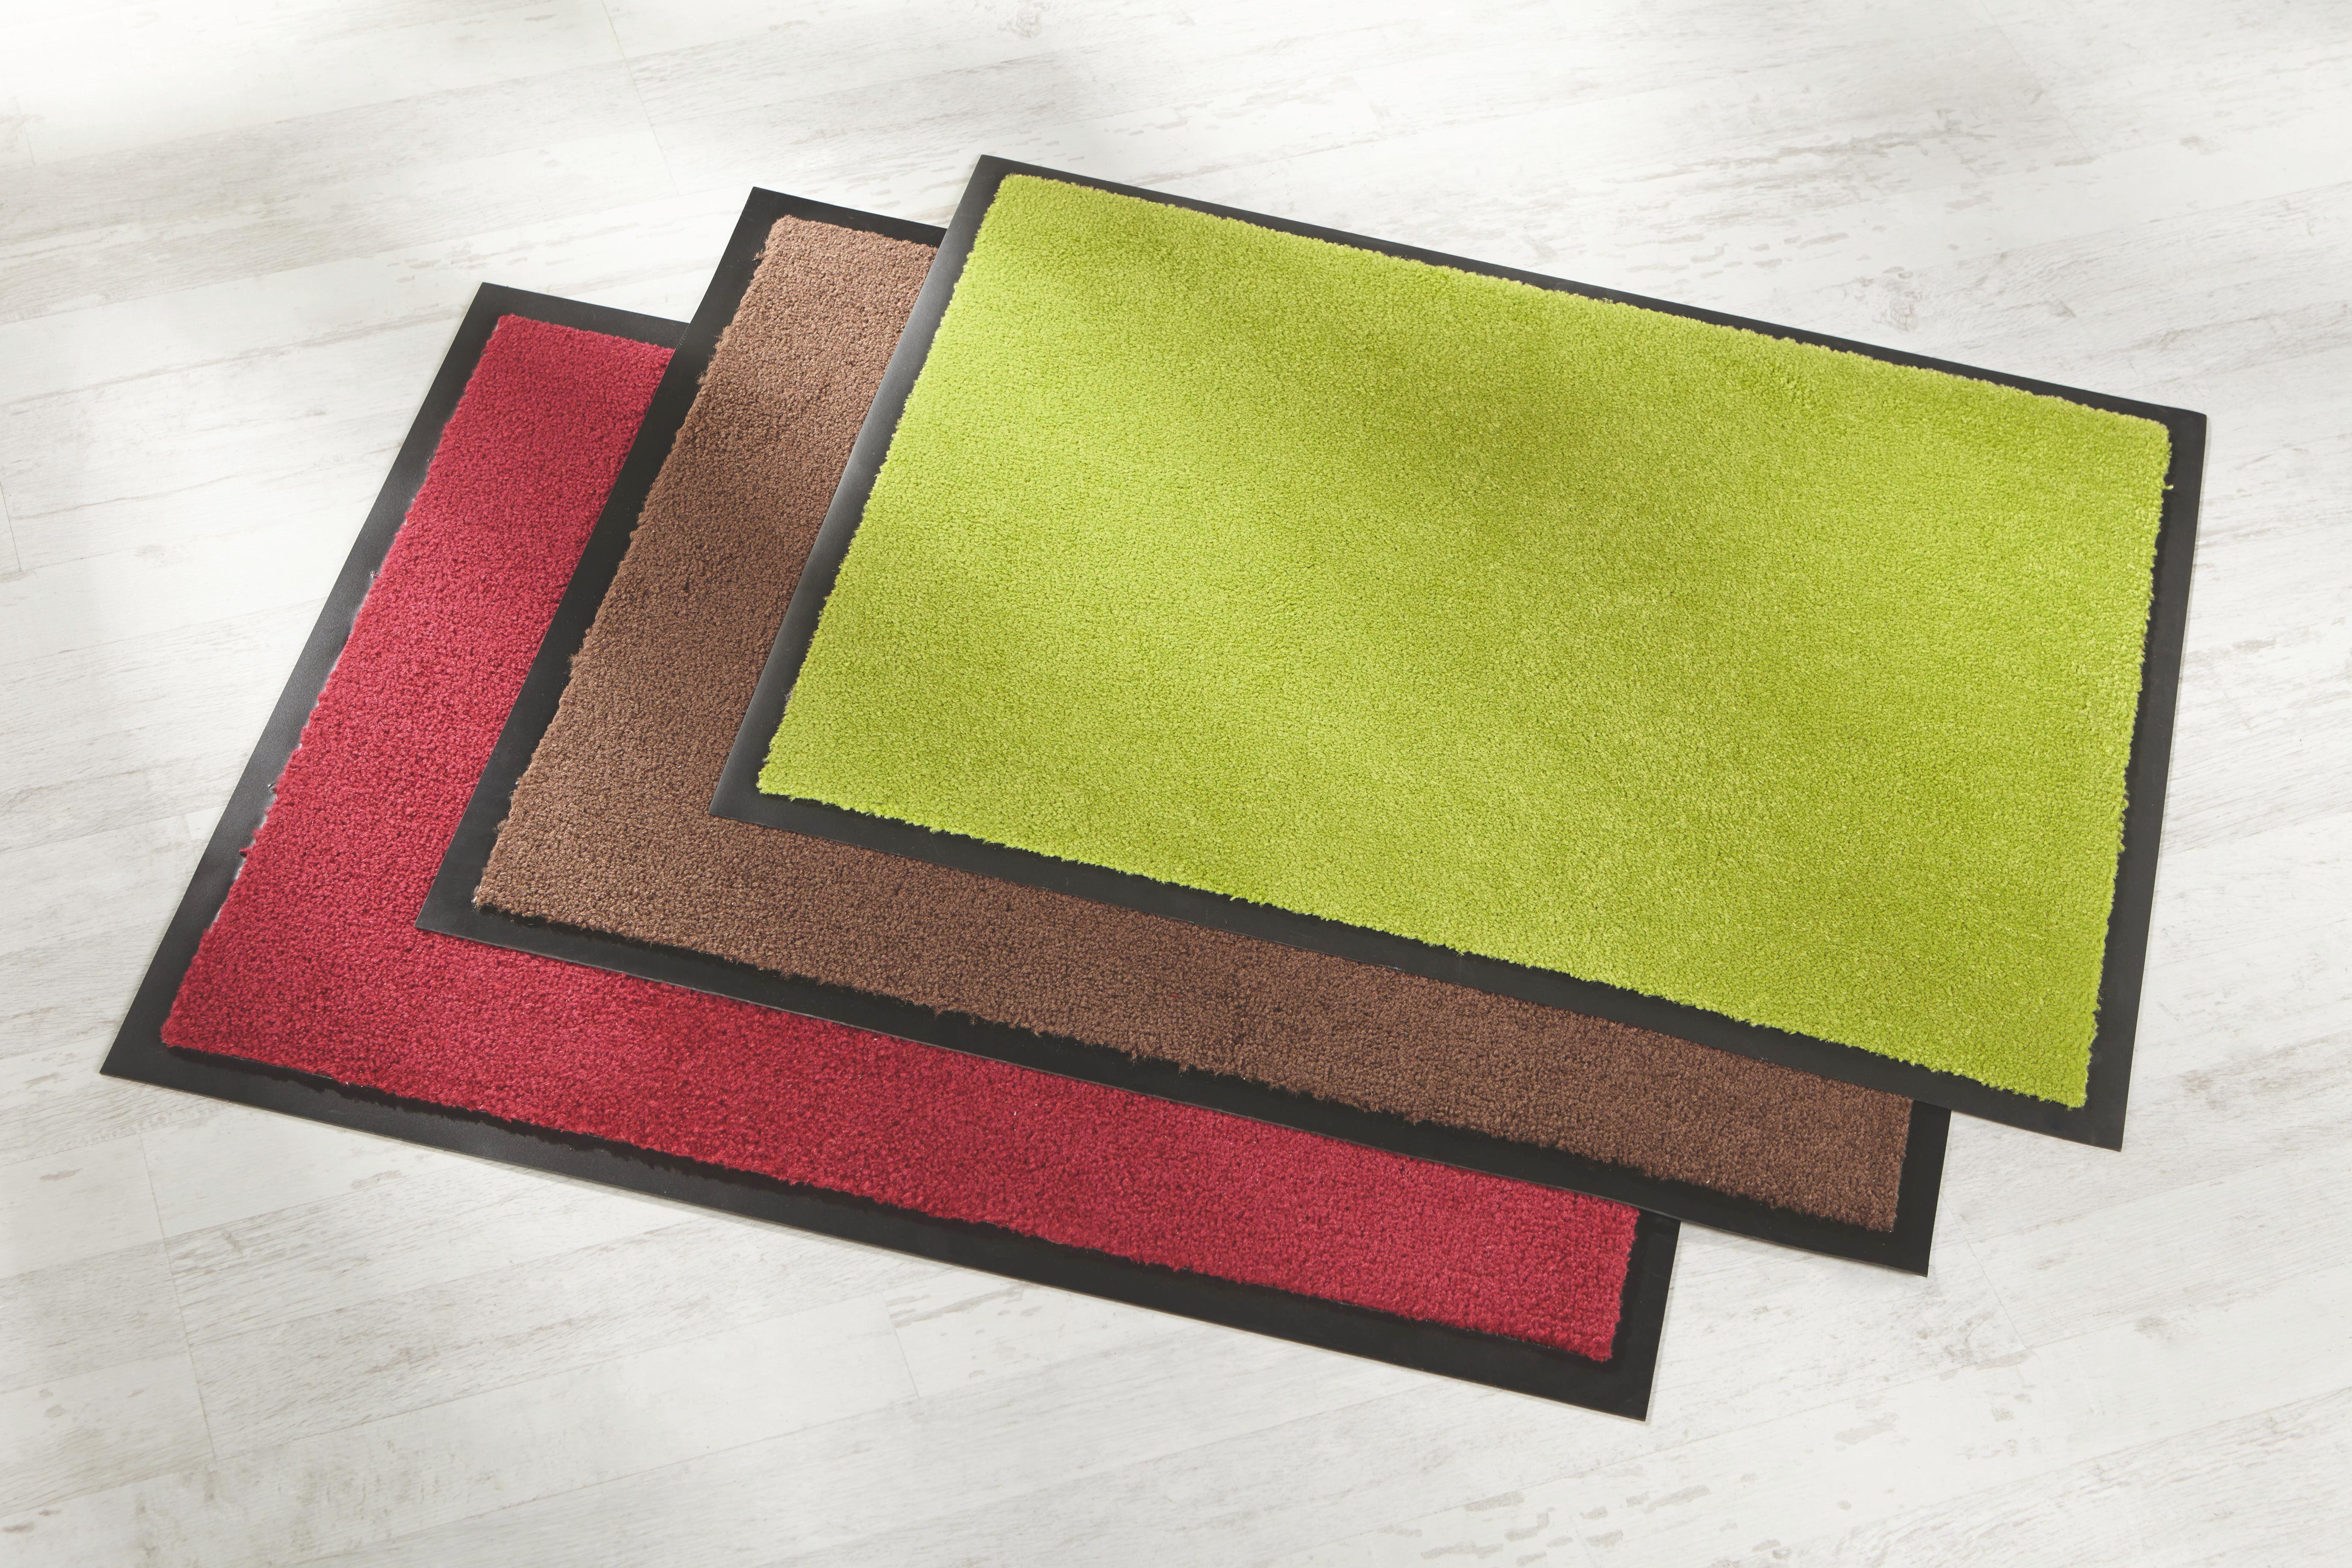 Fußmatte Eton in Rot, ca. 40x60cm - Rot, LIFESTYLE, Textil (40/60cm) - MÖMAX modern living